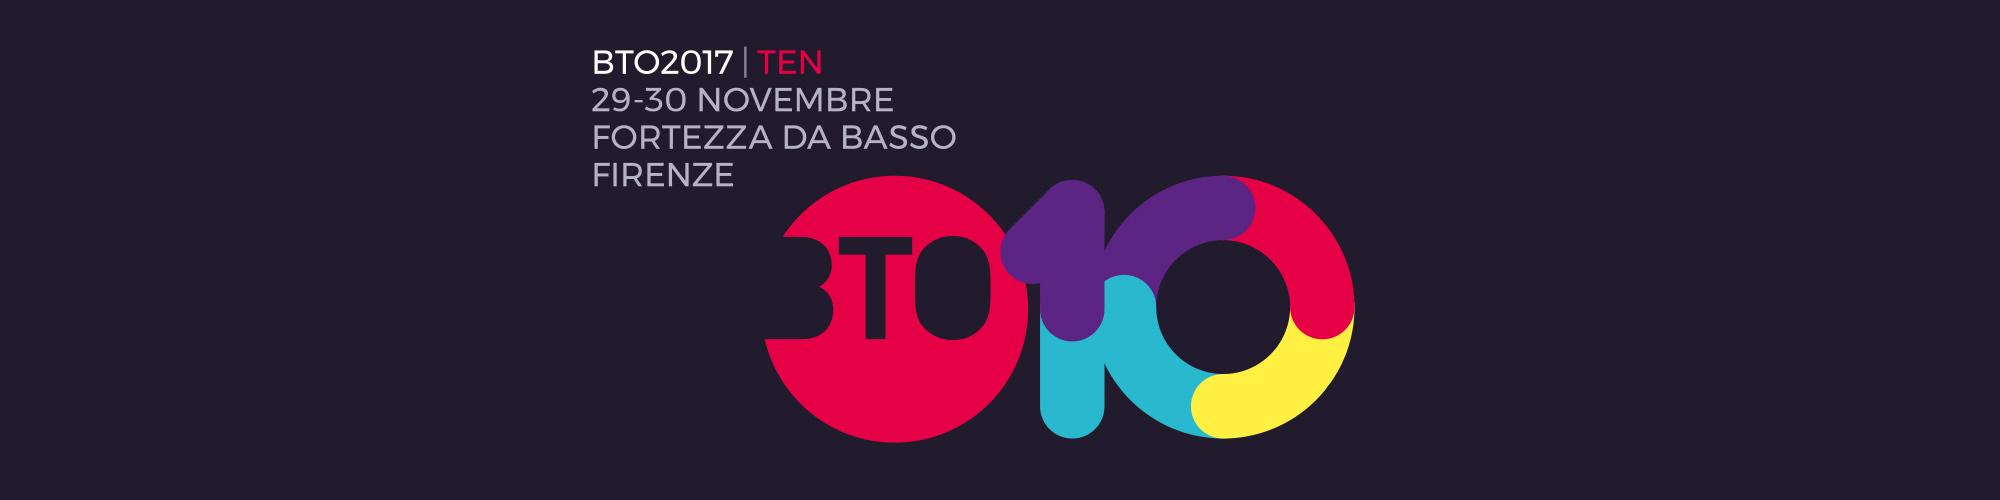 BTO 2017